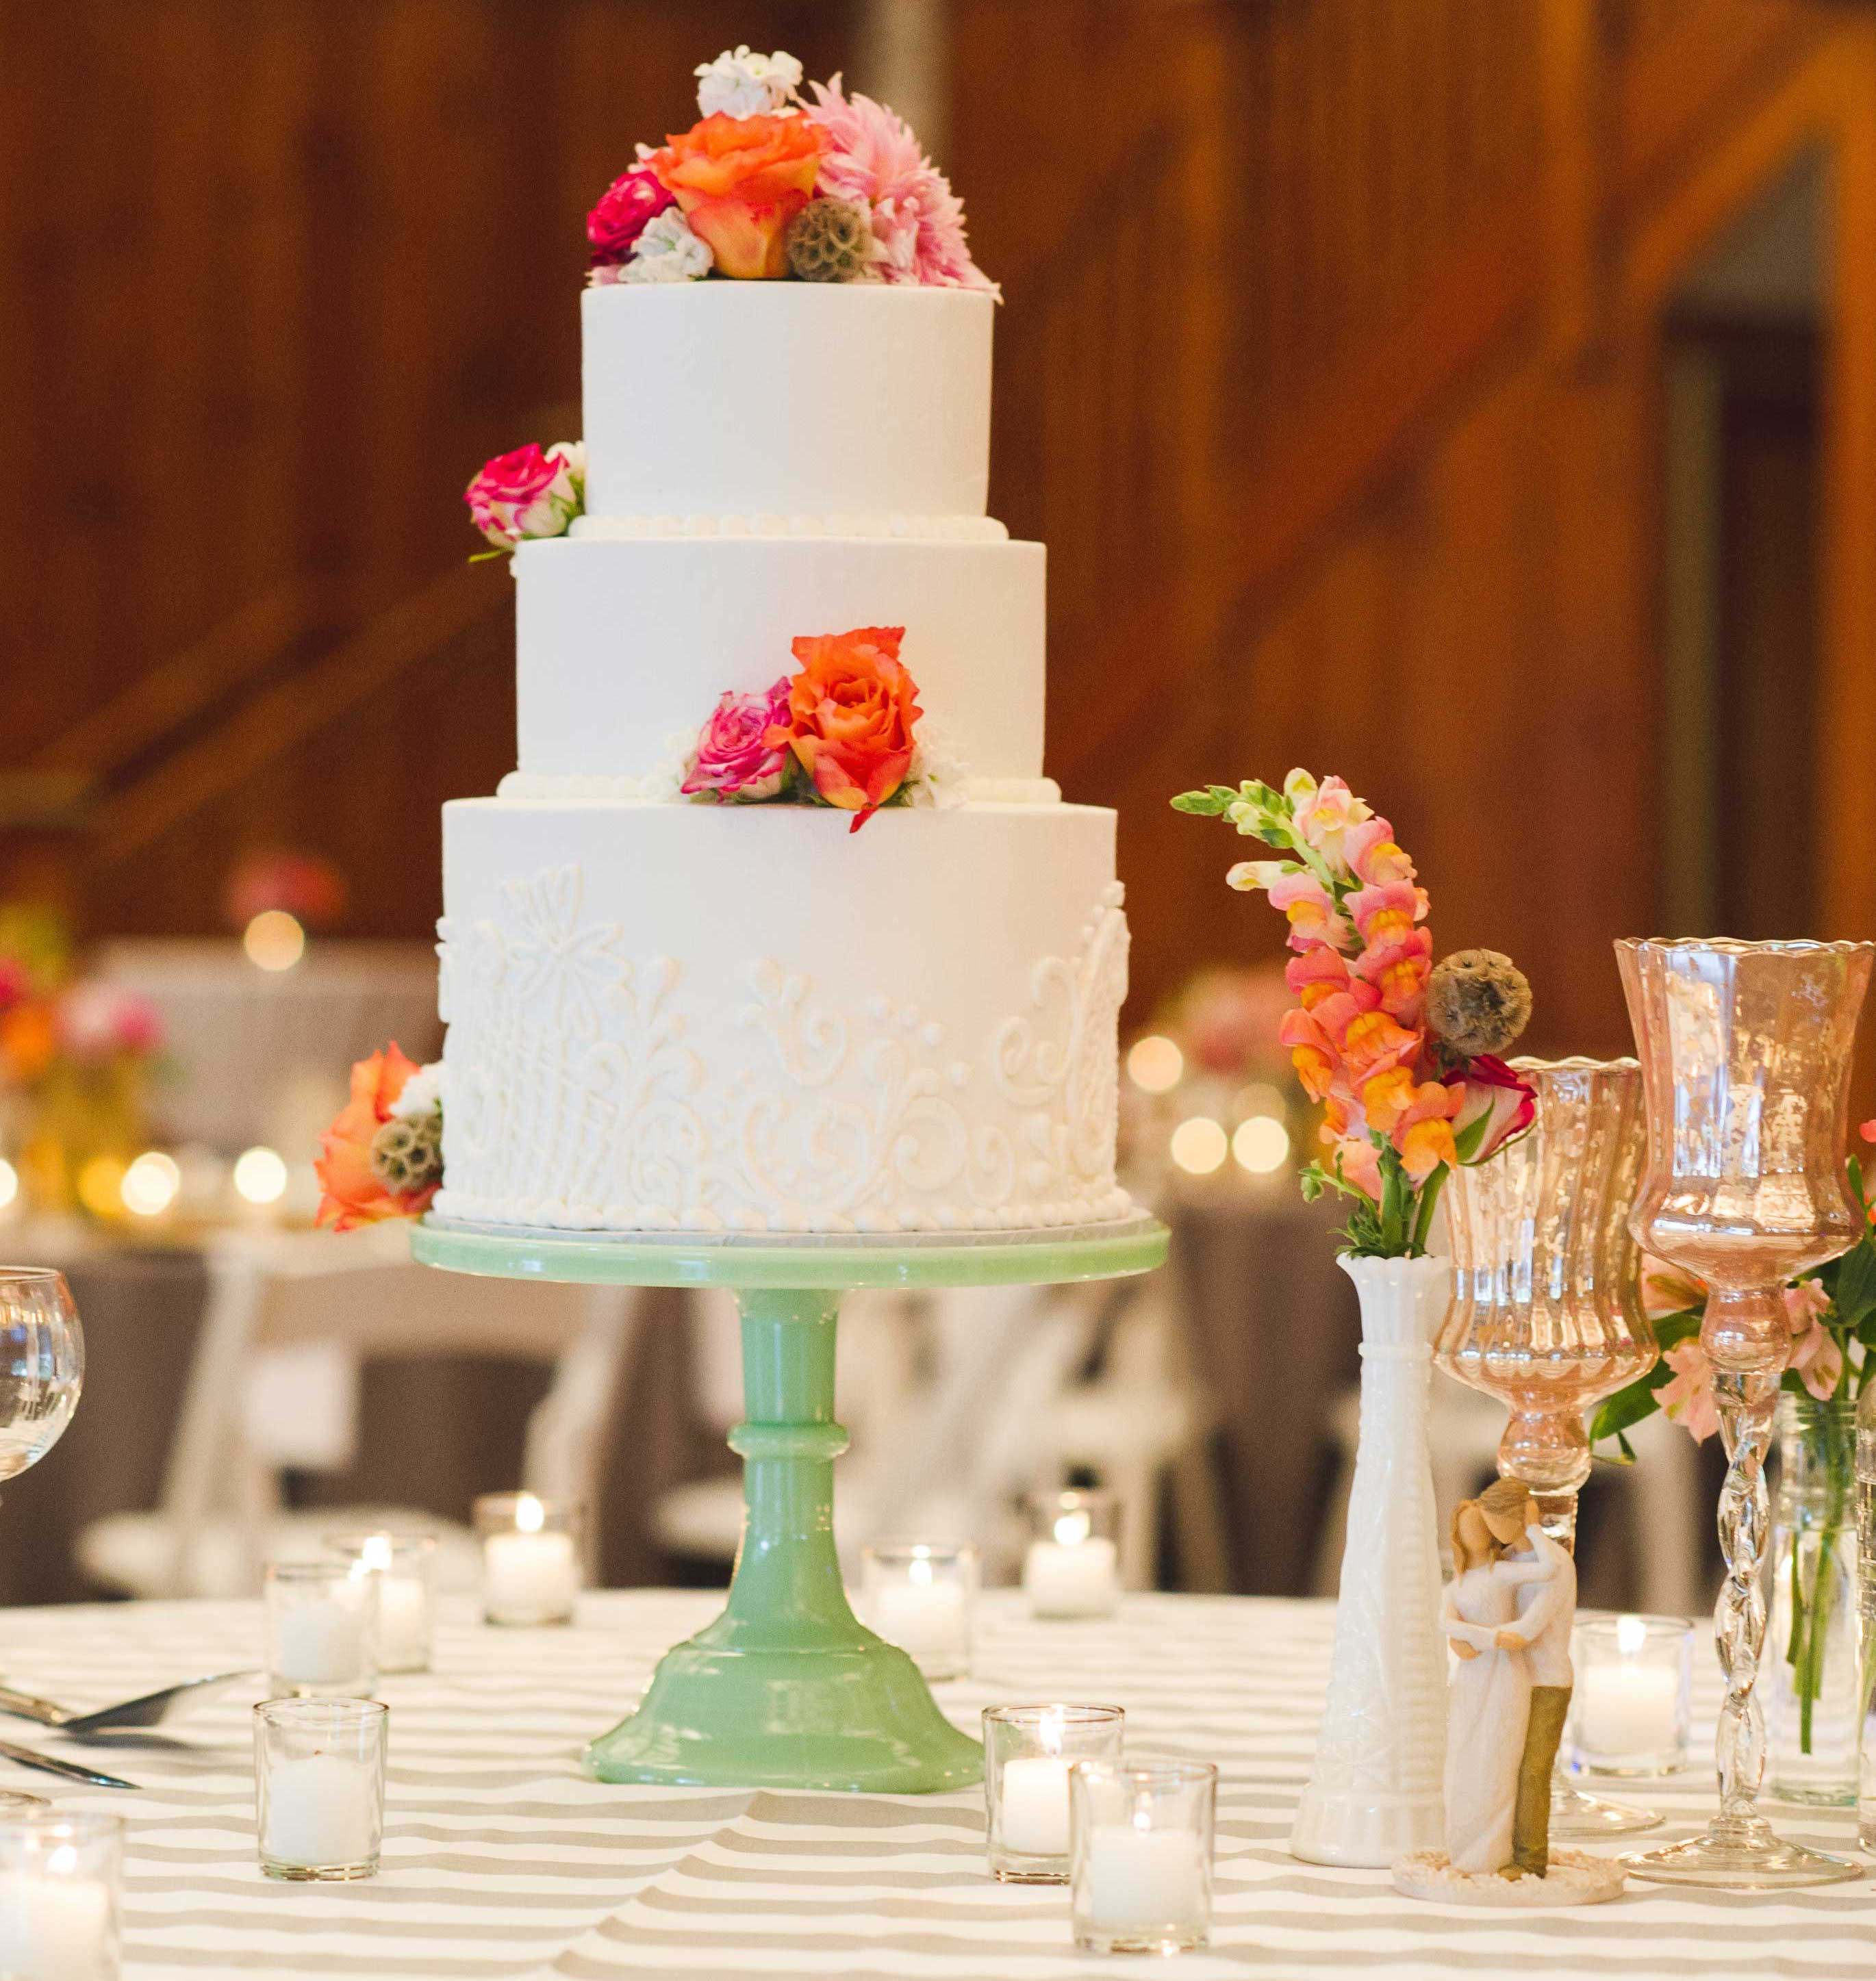 3 Layered Wedding Cakes  Wedding Cake Ideas Small e Two and Three Tier Cakes